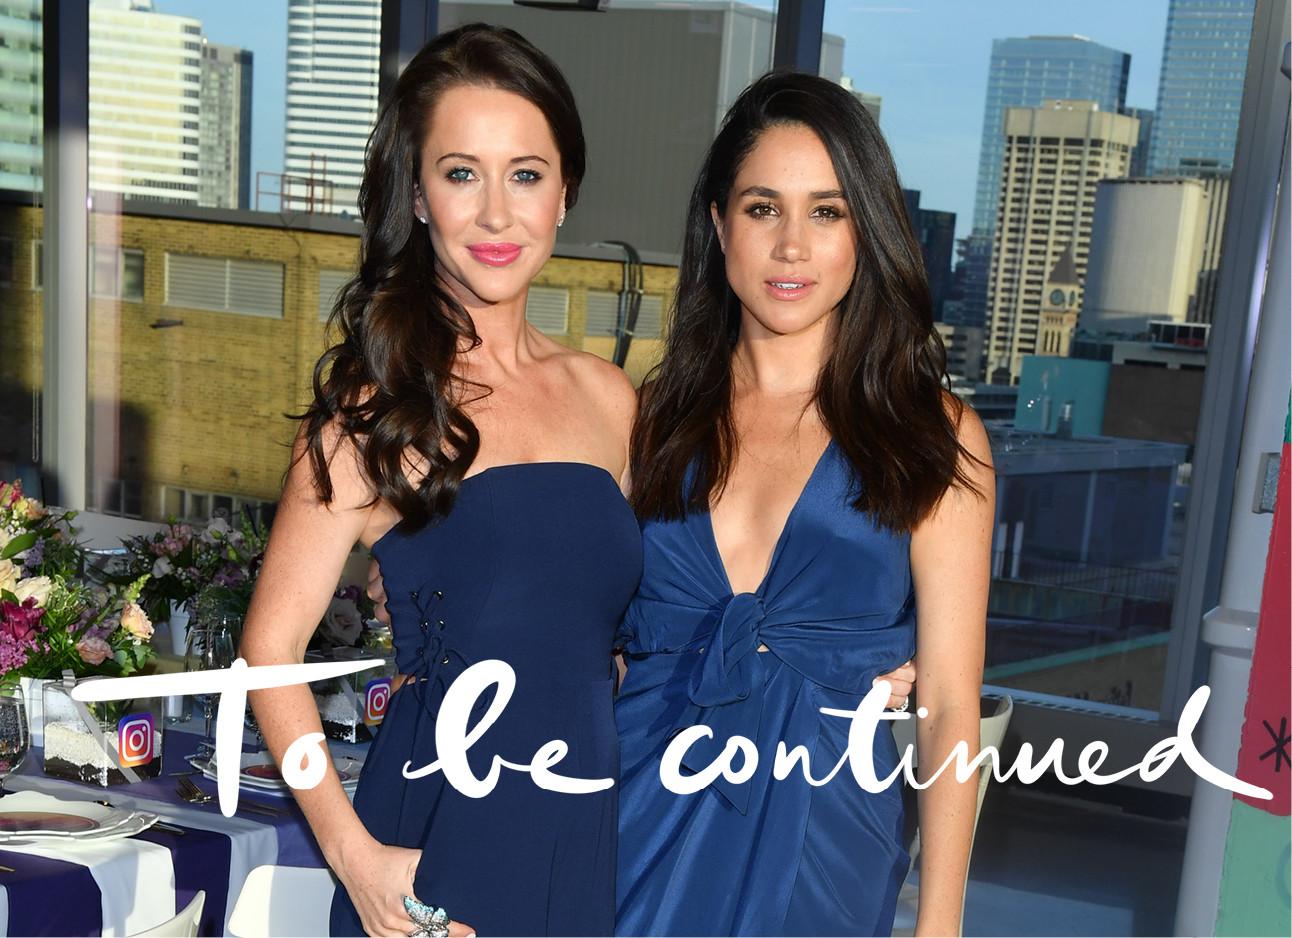 Meghan en haar vriendin Jessica in blauwe jurken